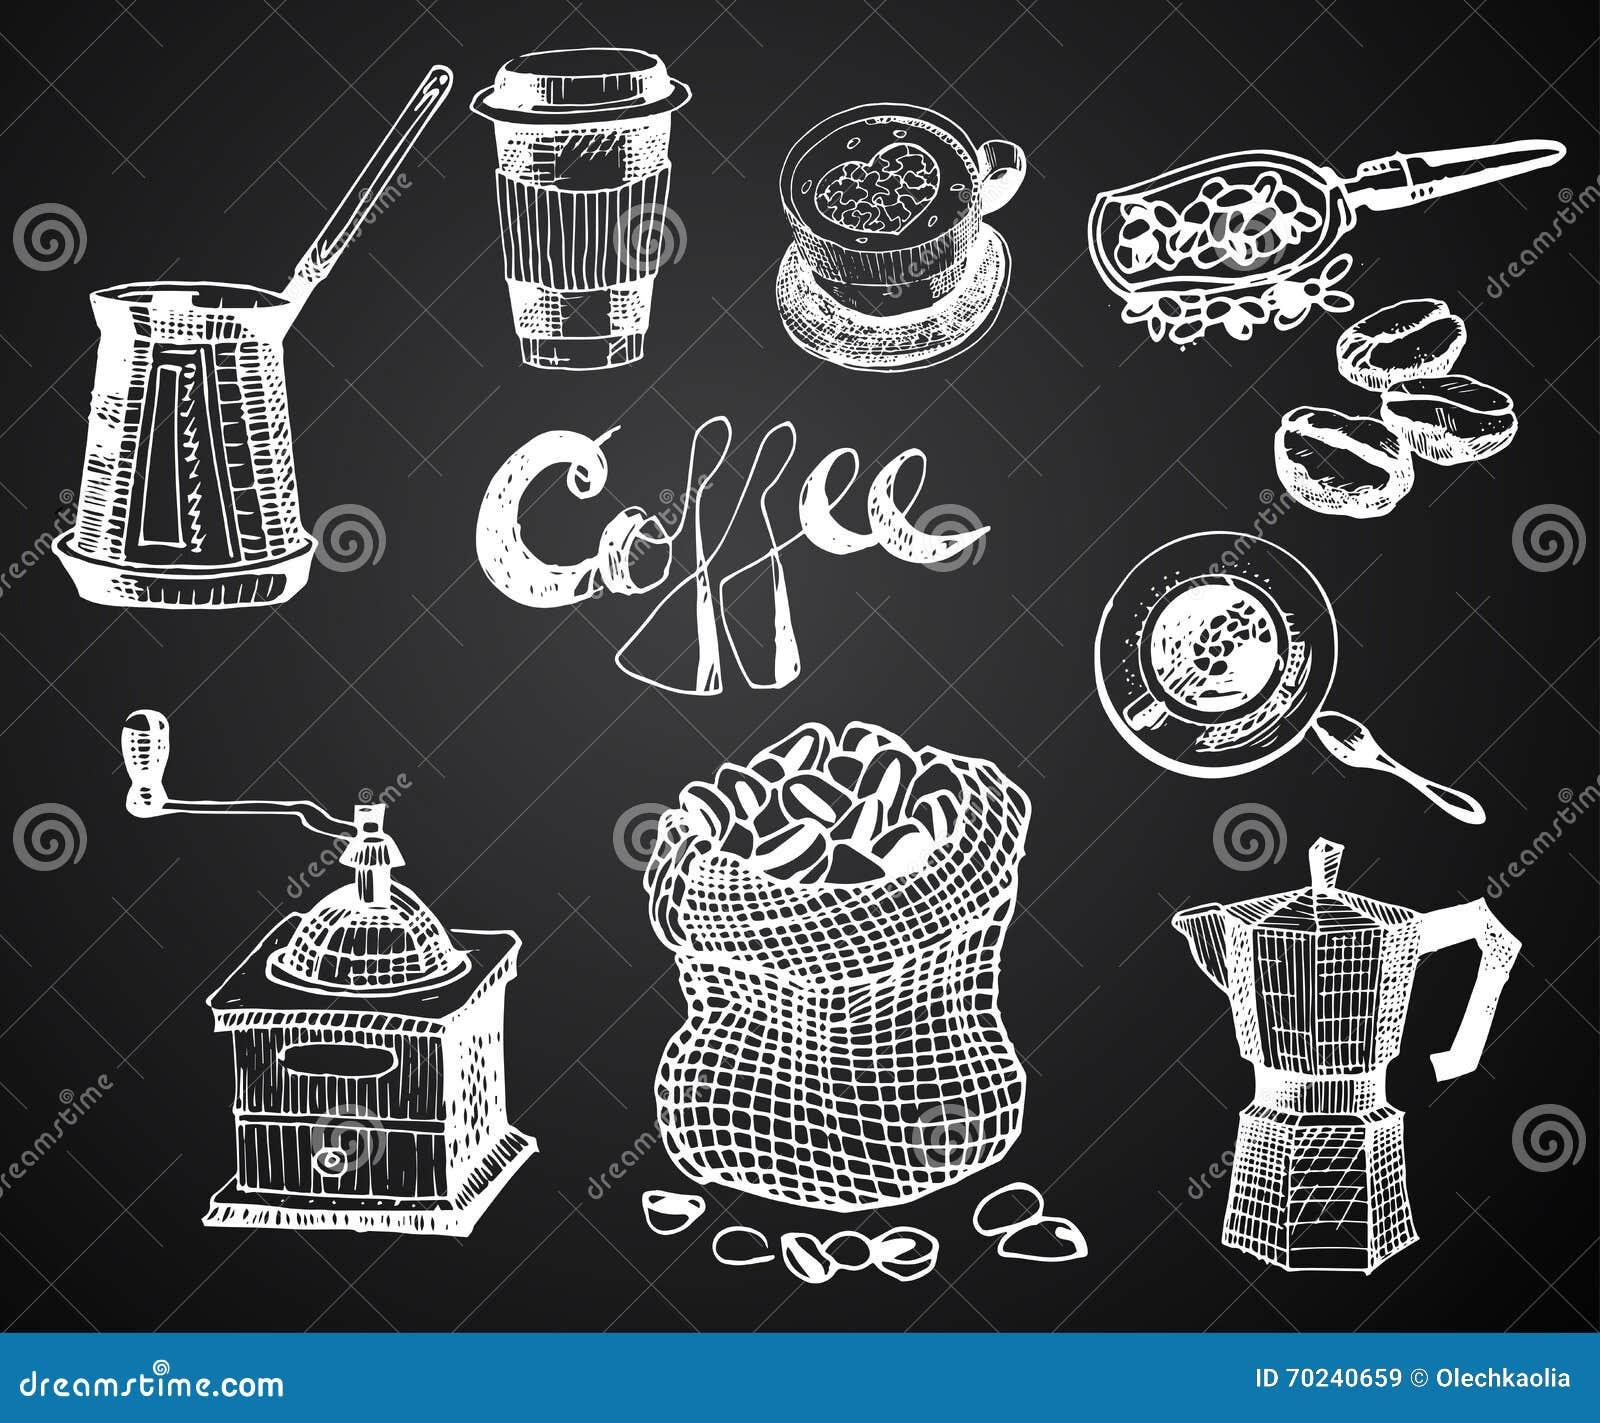 Coffee Shop Illustration Design Elements Vintage Cartoon